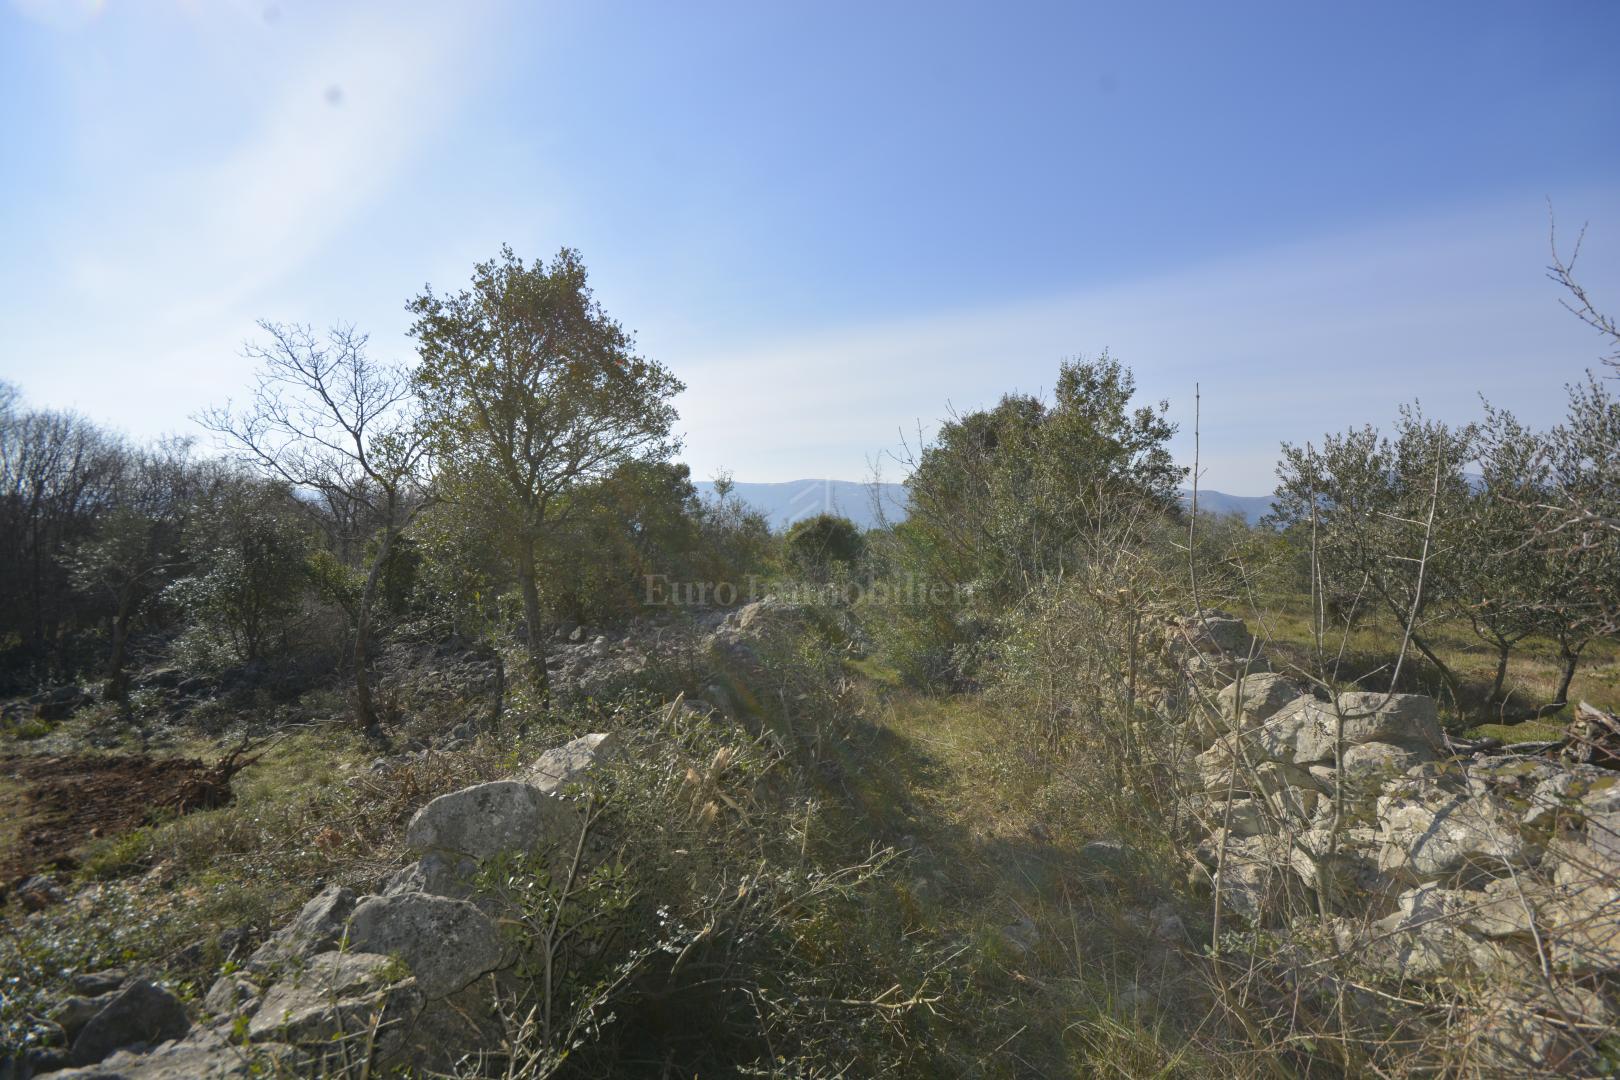 Građevinsko zemljište s otvorenim pogledom na more